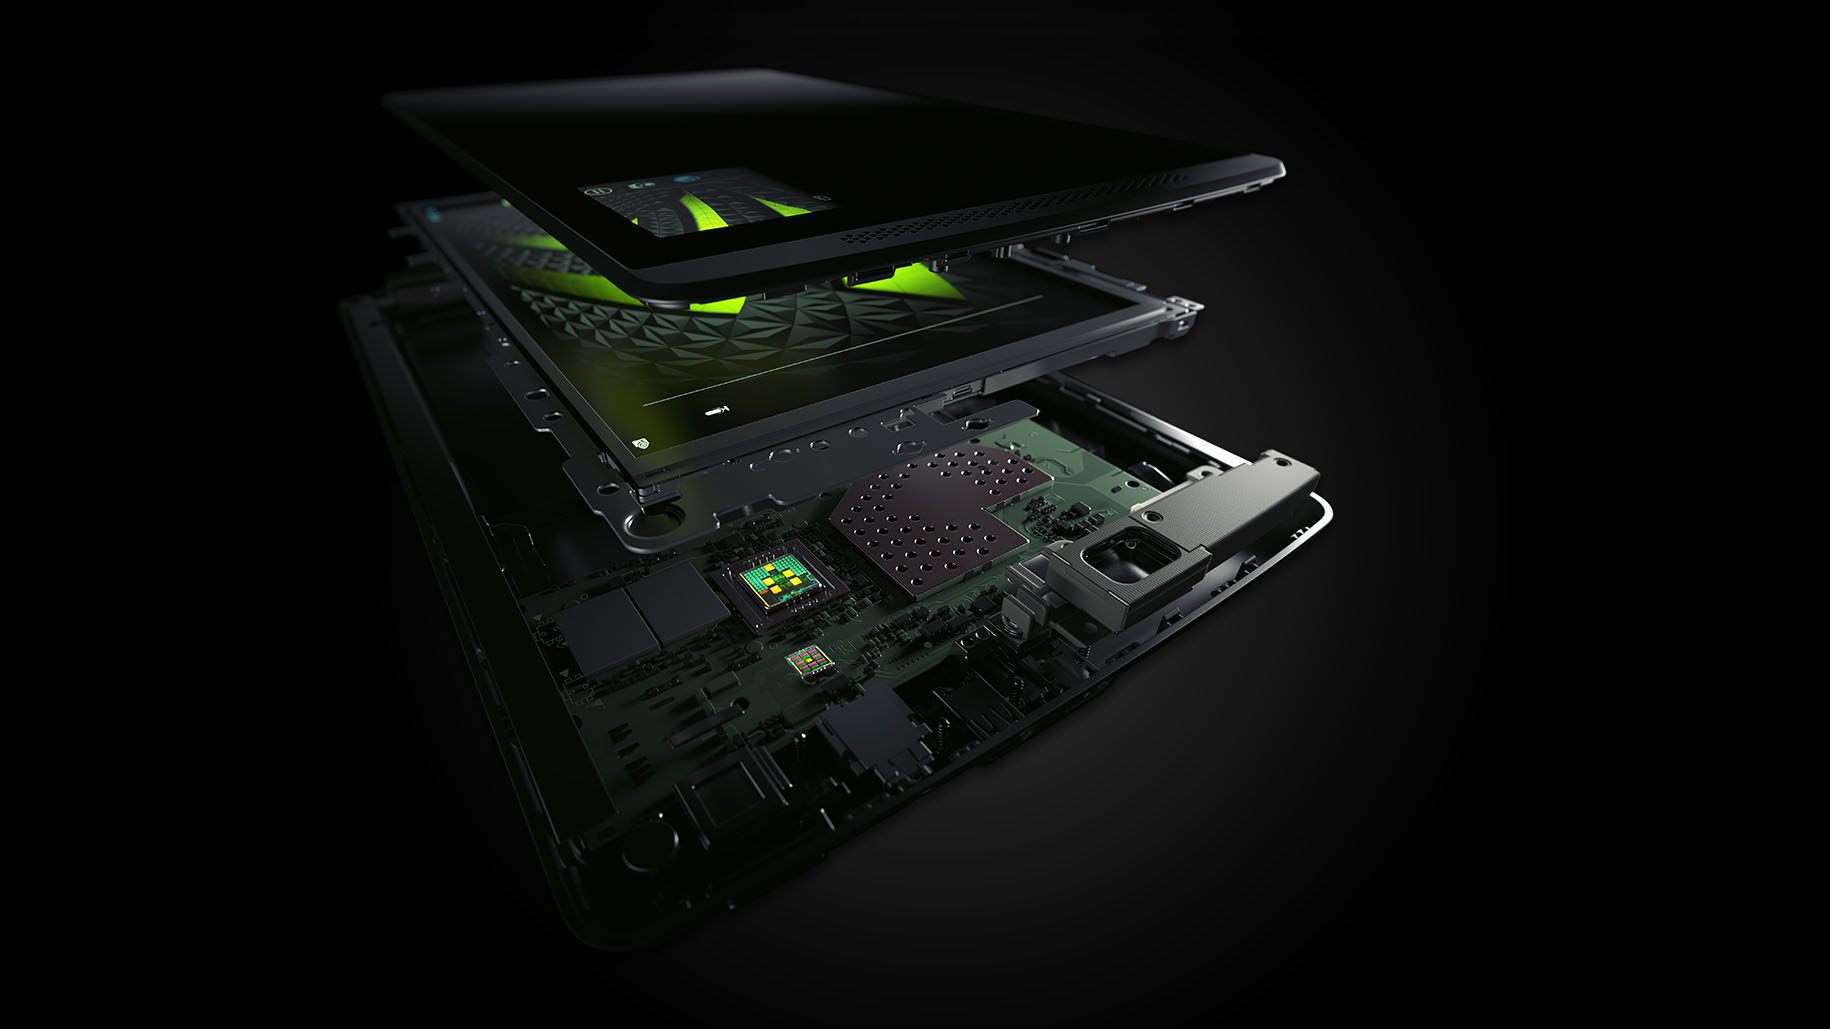 NVIDIA debuts Tegra Note 7 LTE